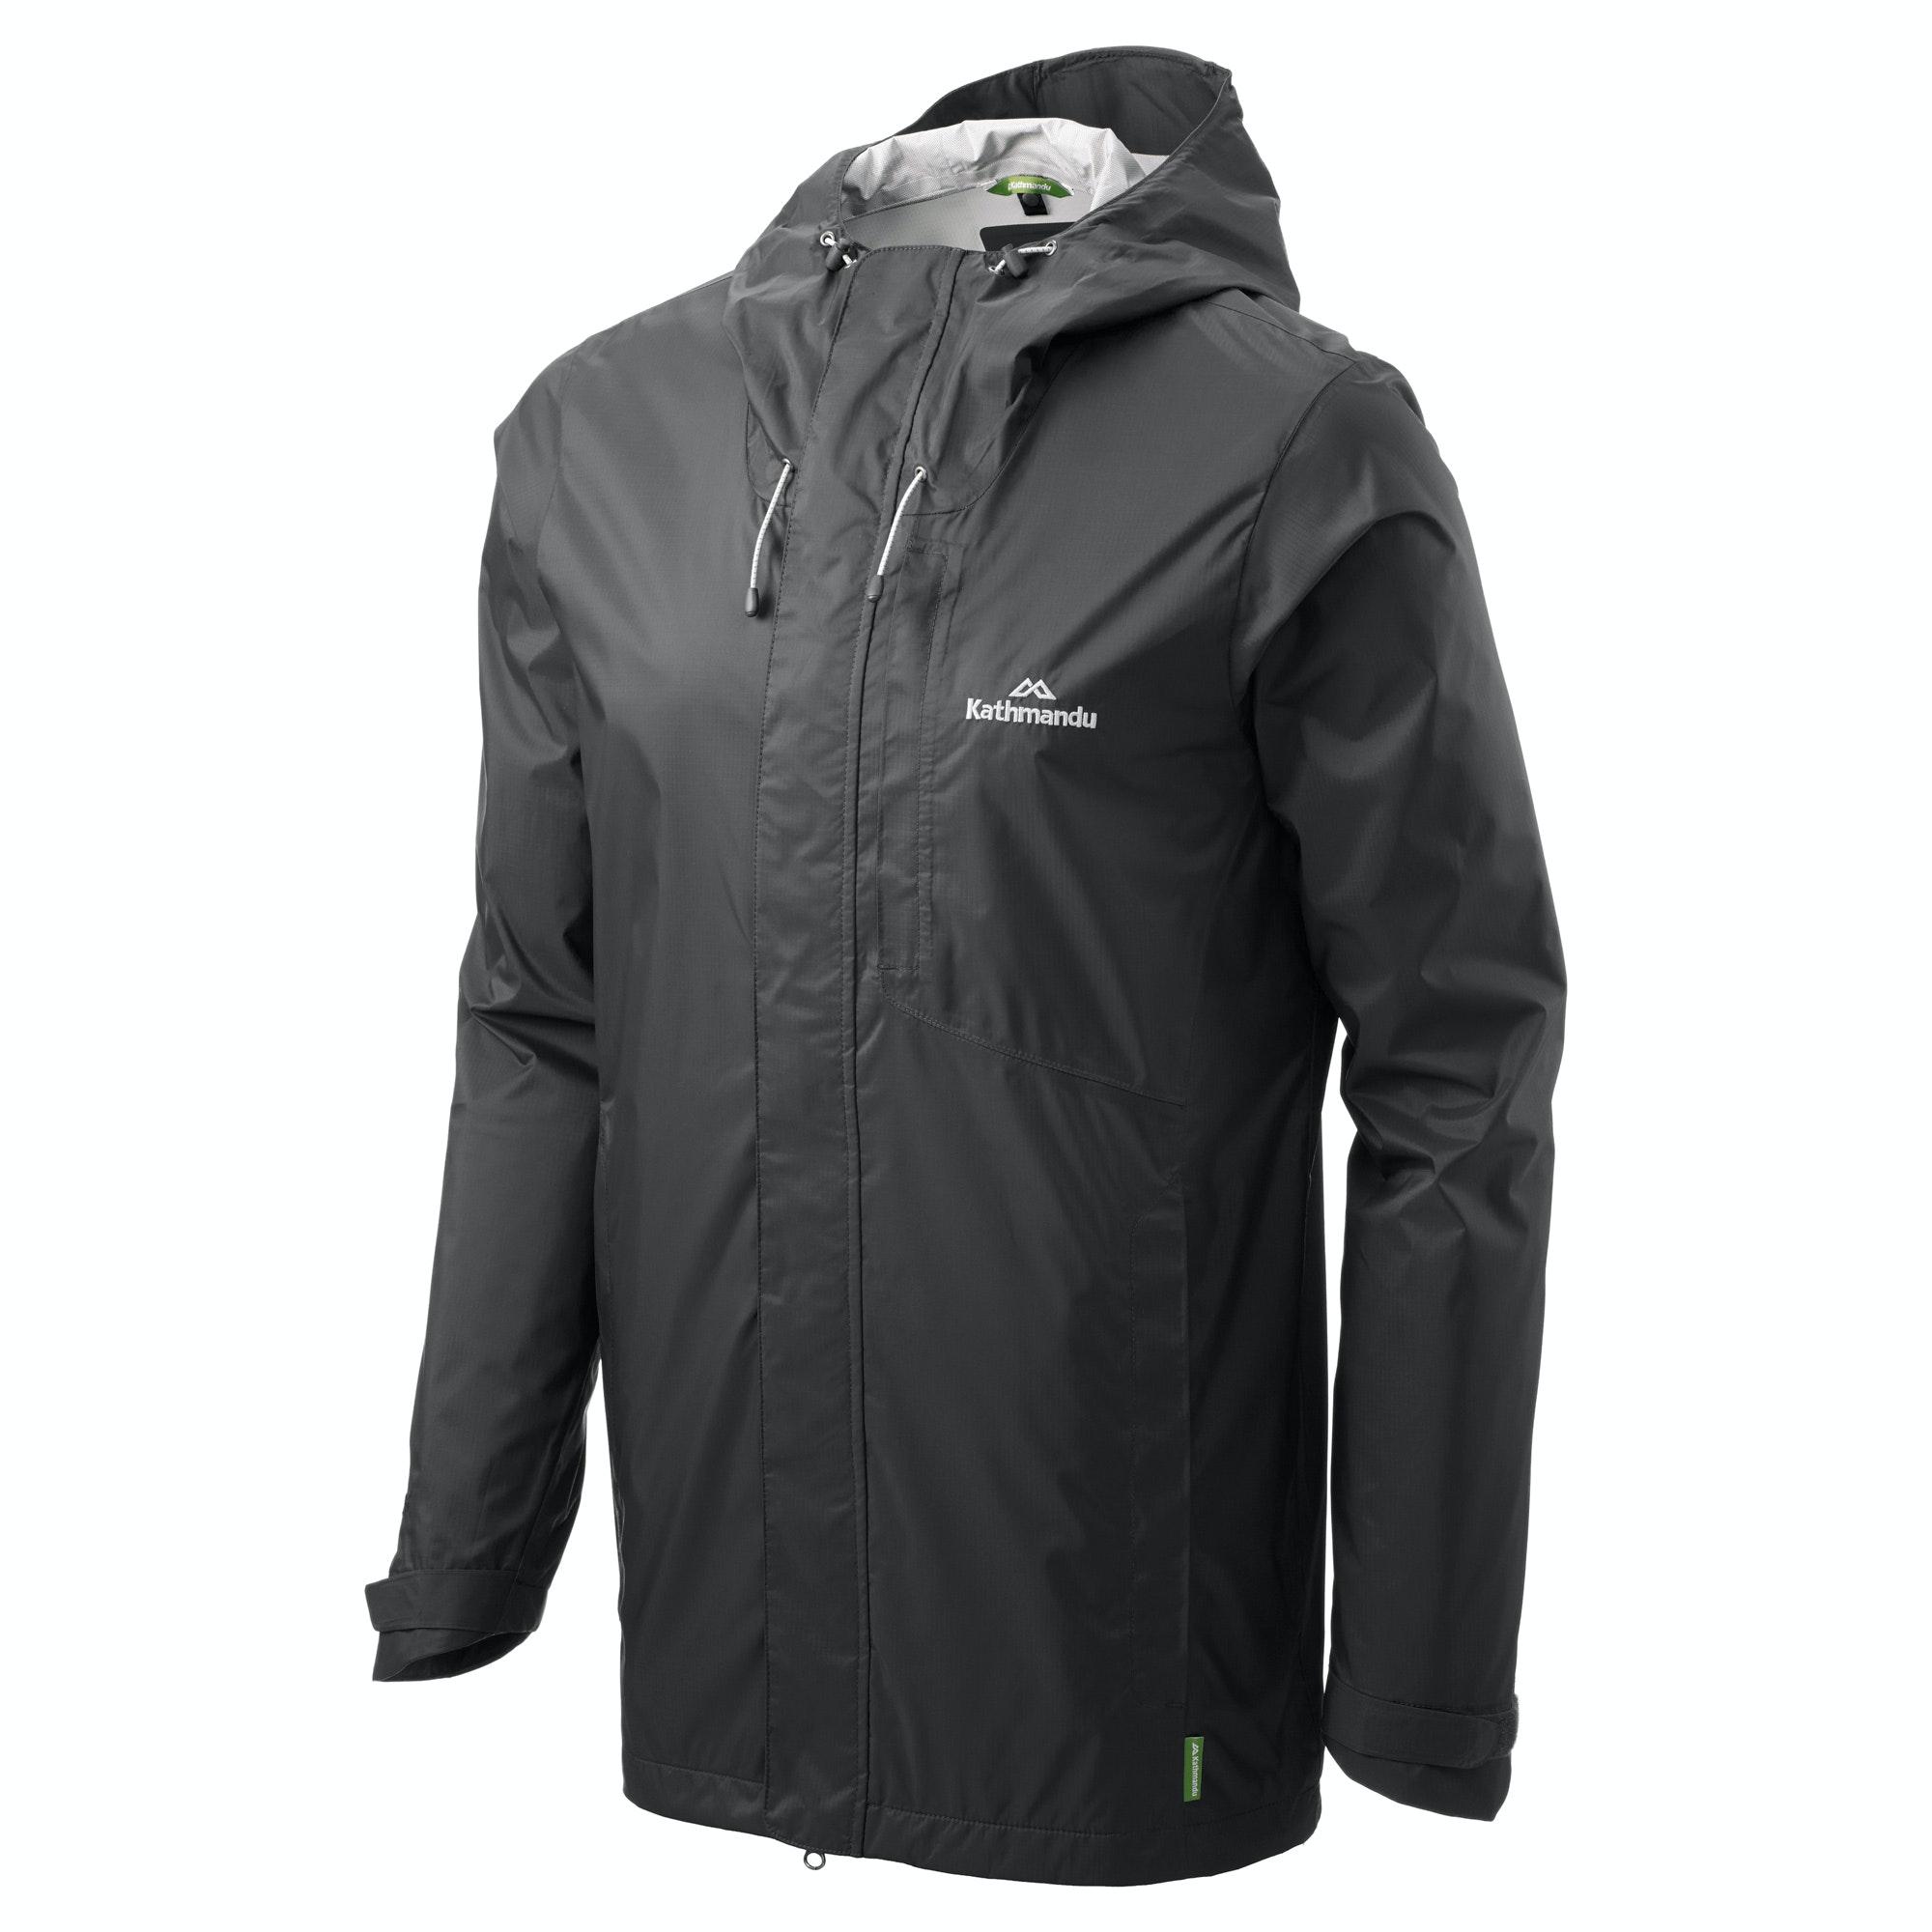 Kathmandu-Trailhead-Mens-Lightweight-Outdoor-Hiking-Waterproof-Rain-Jacket-Coat